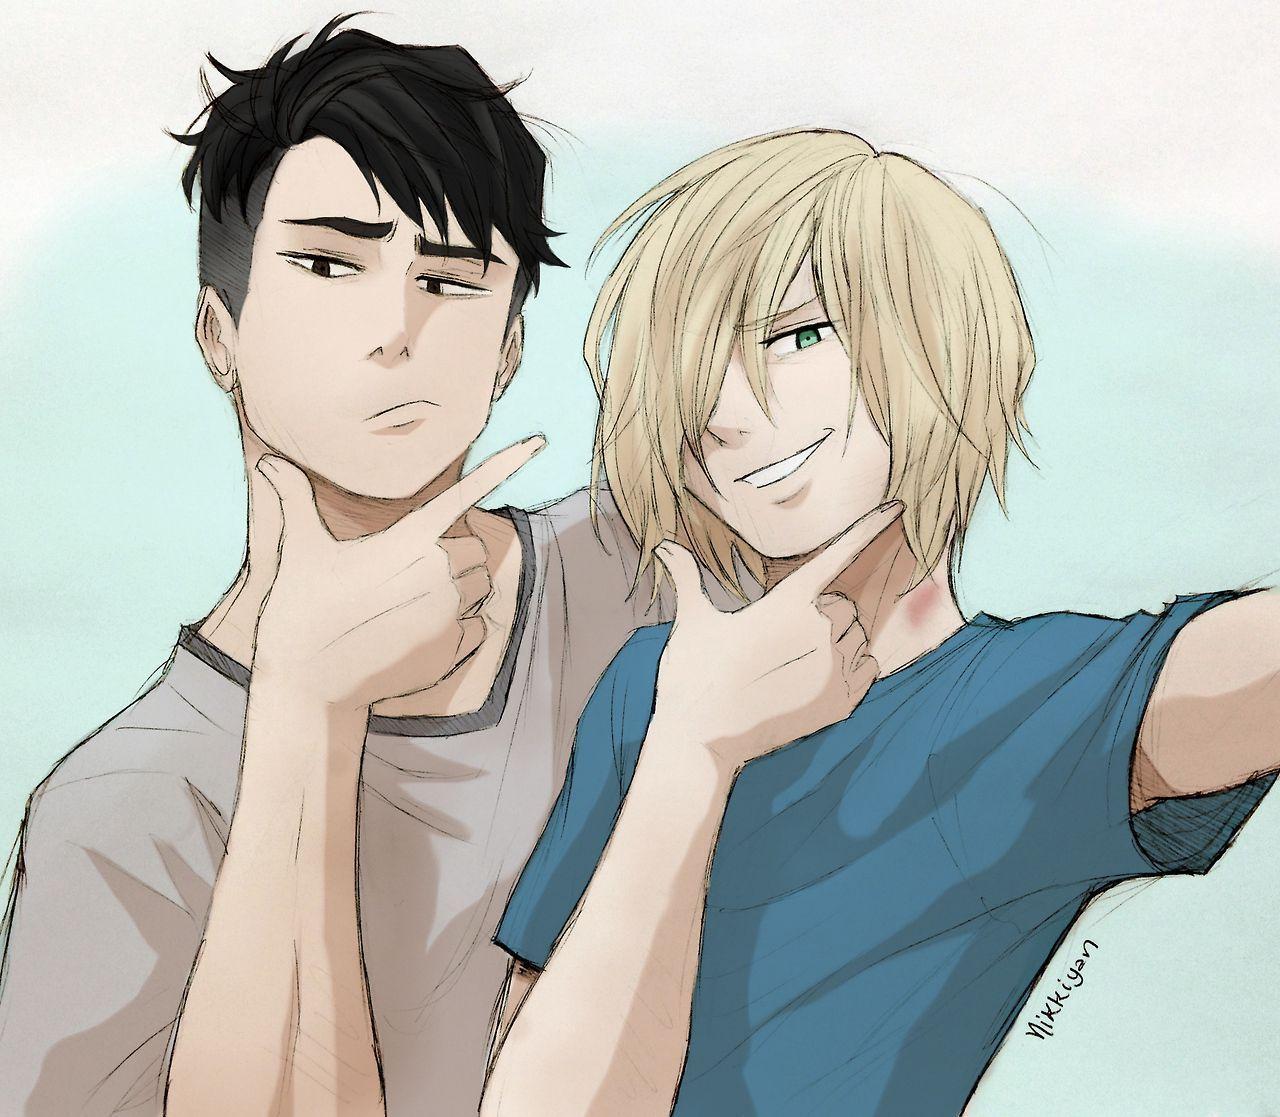 Yuri!!! On Ice comics, pics, and ships! - Otayuri pics